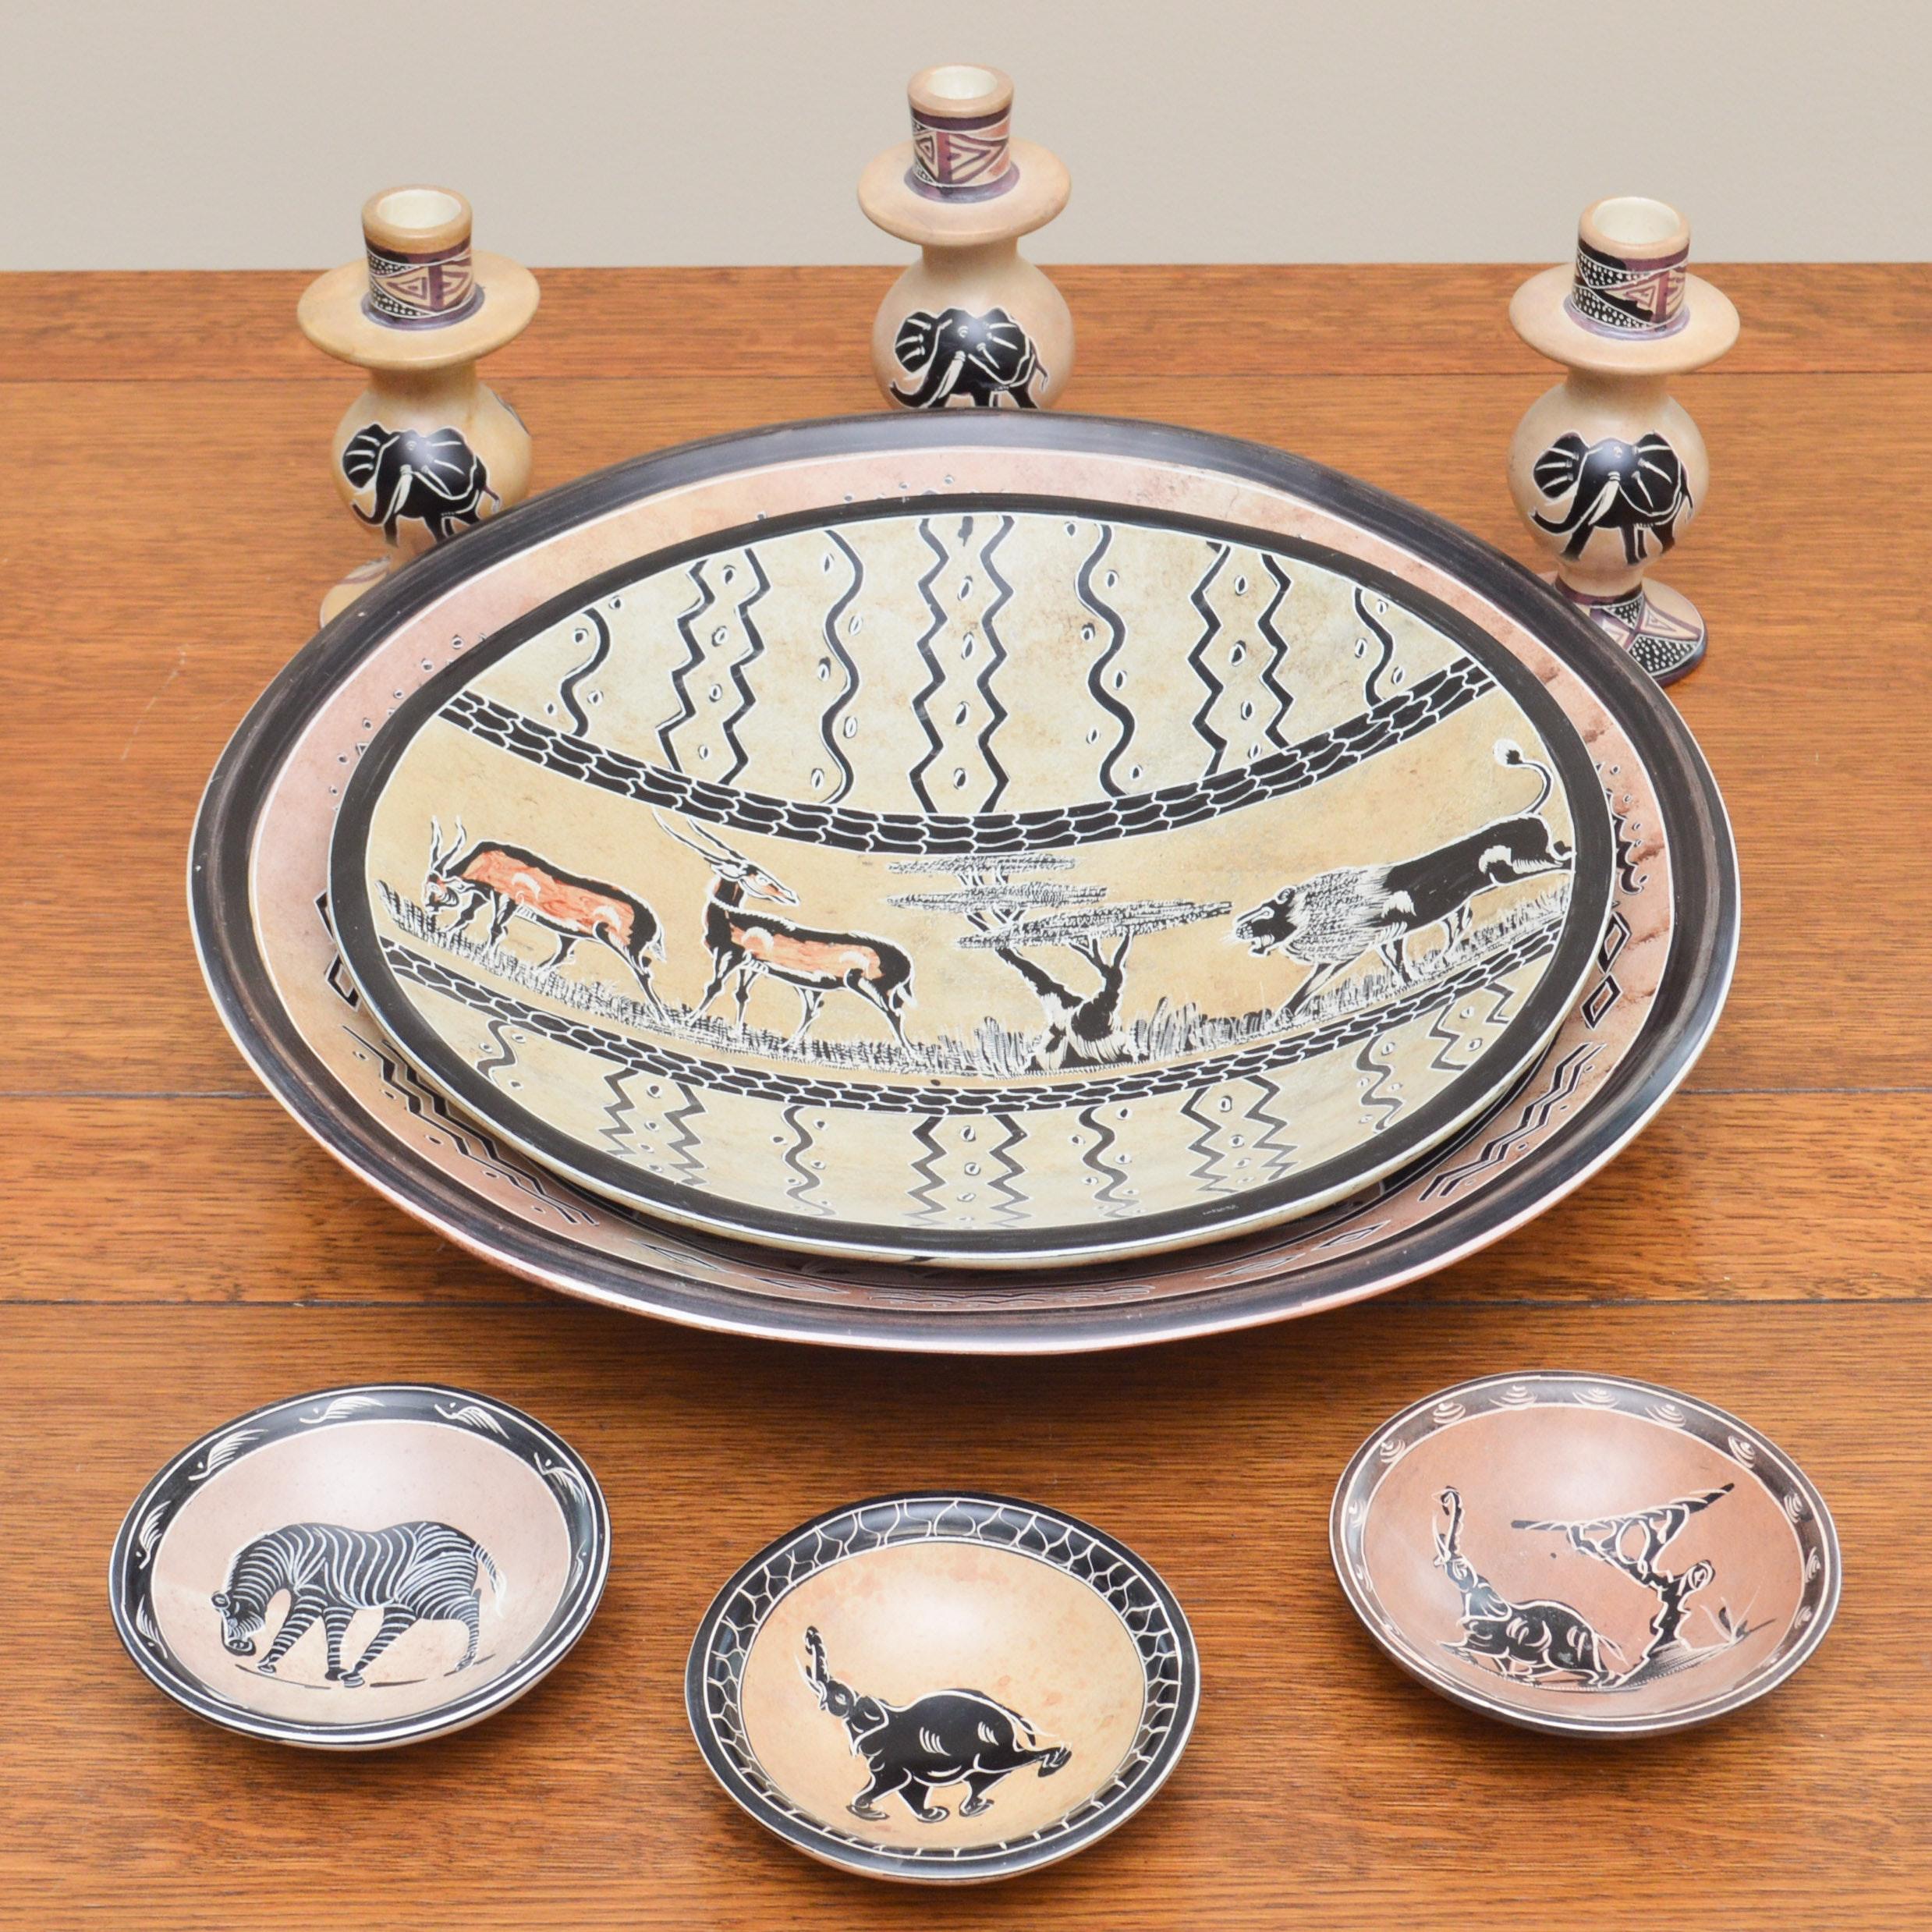 Hand-Painted Ceramic Decor from Kenya